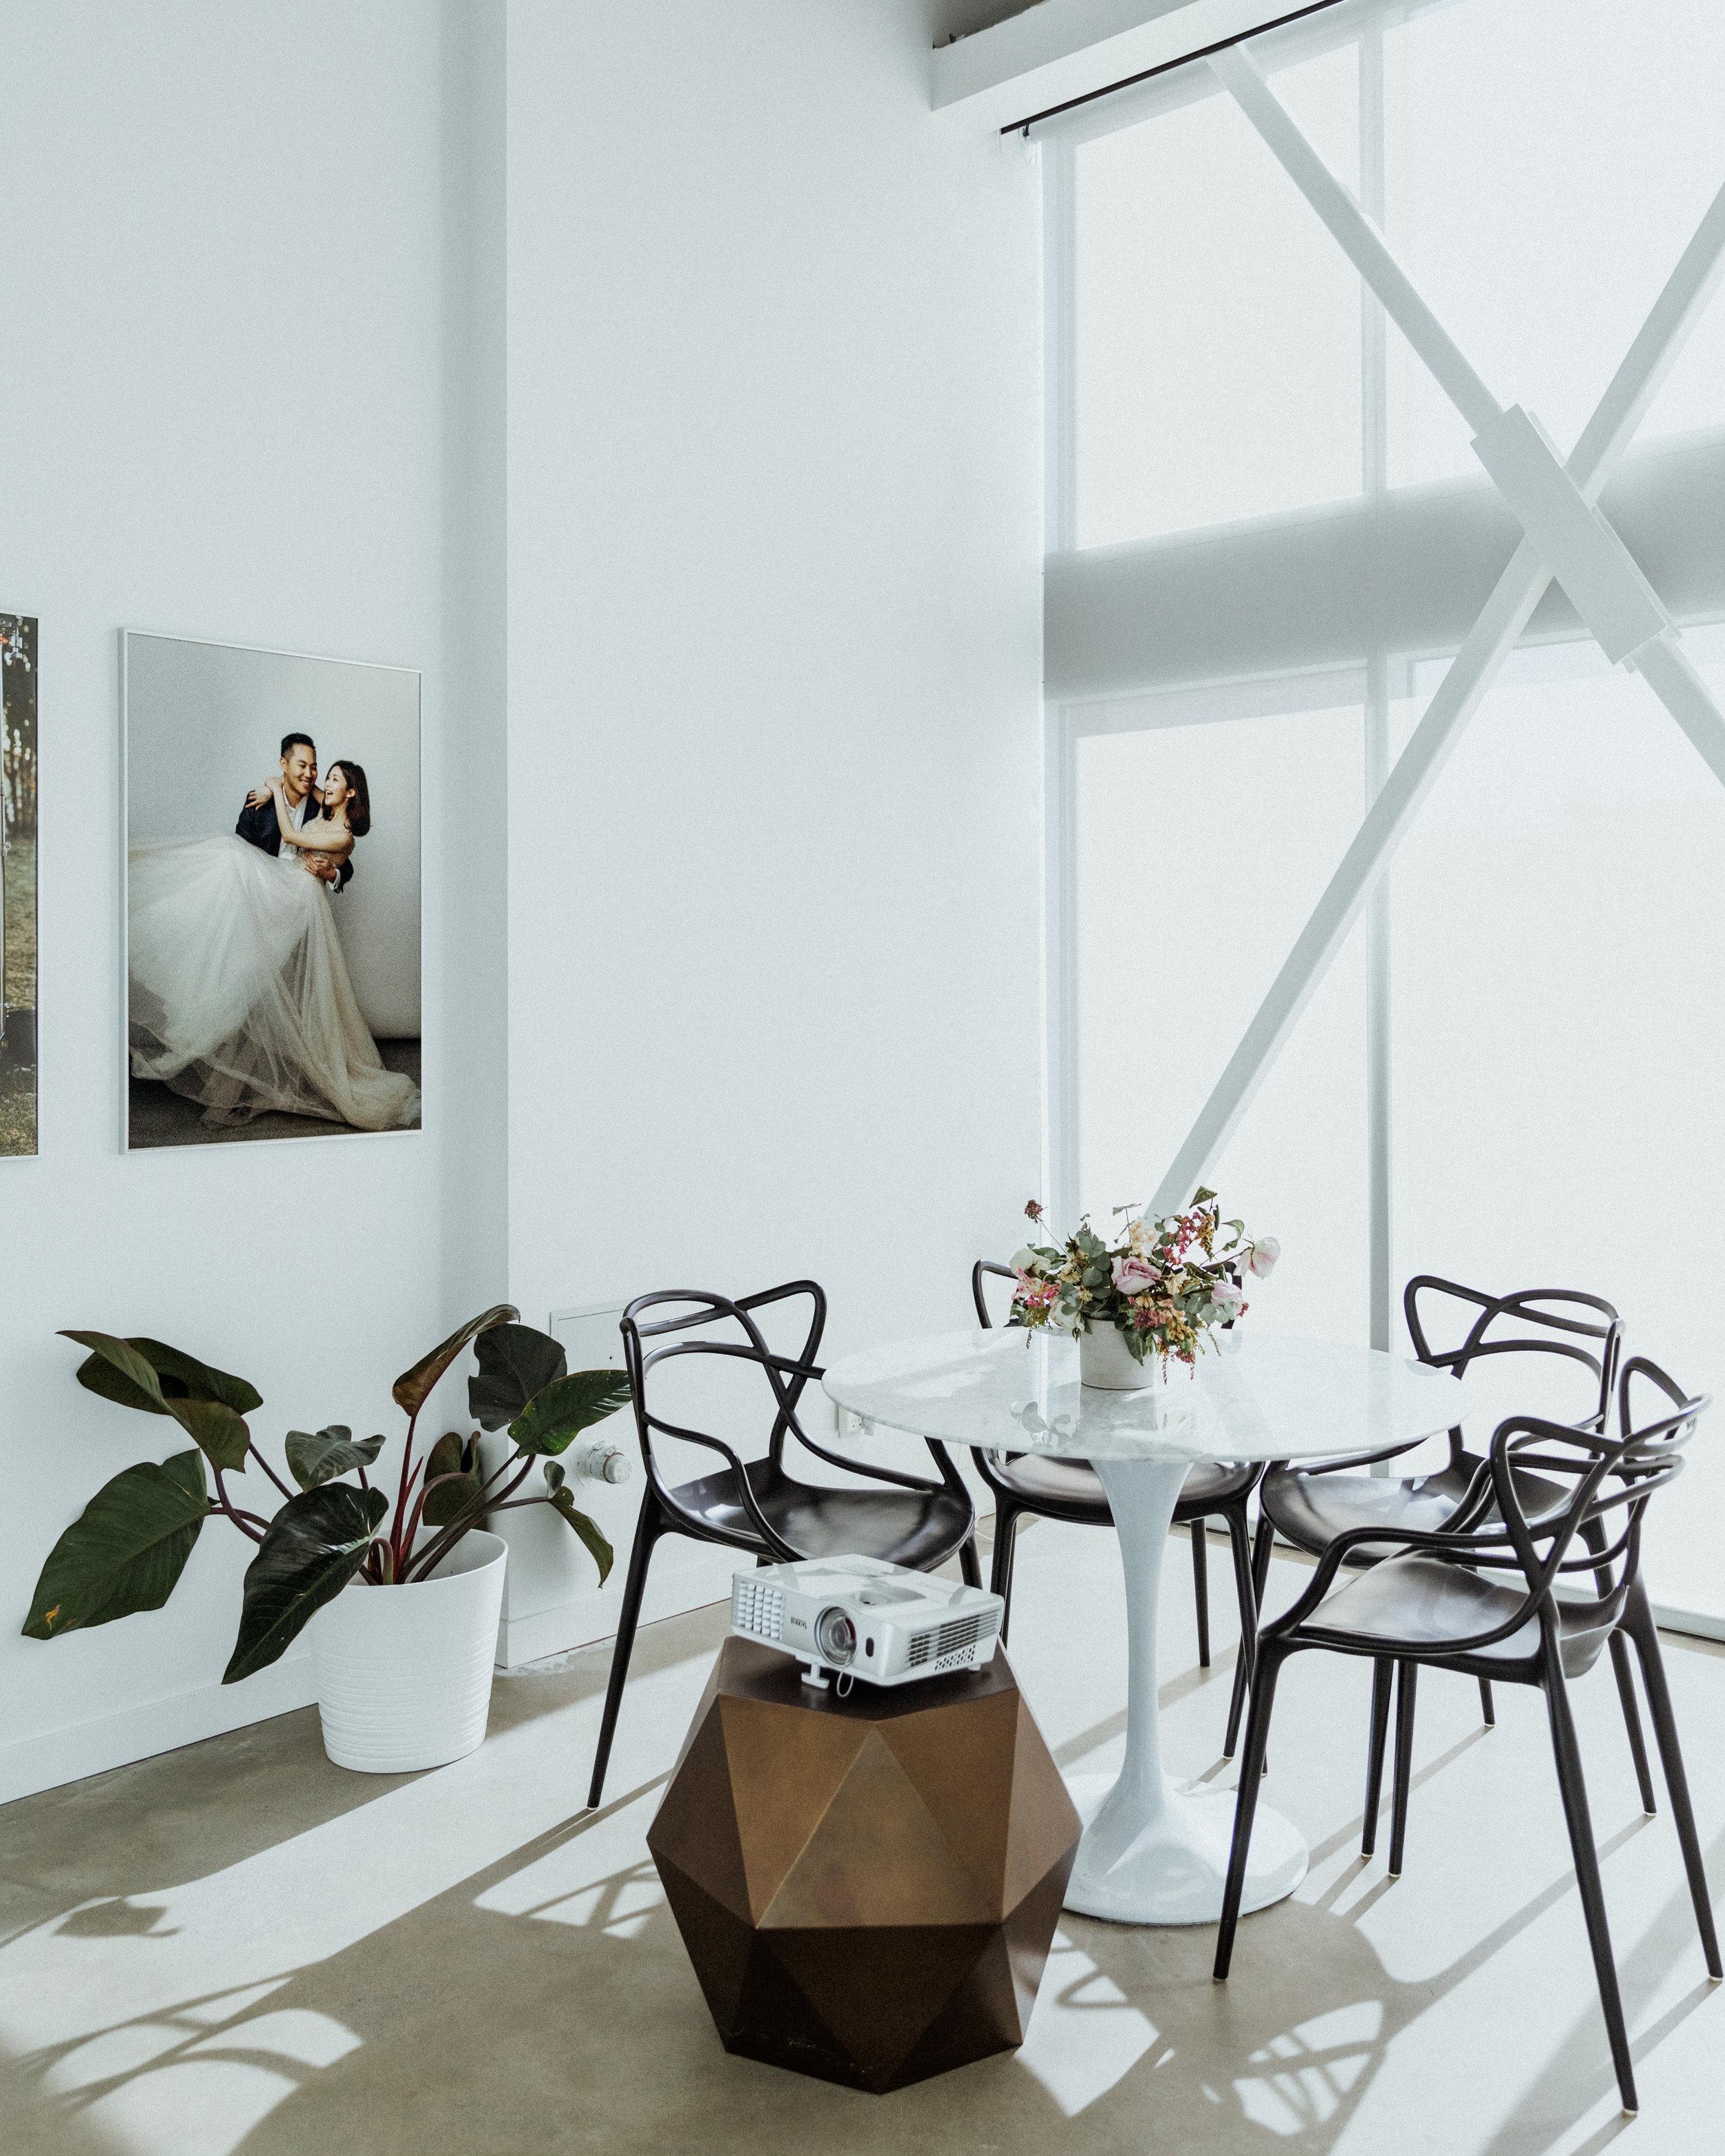 HeraStudios_Selects_Full_2019_StudioPhotos-1.jpg